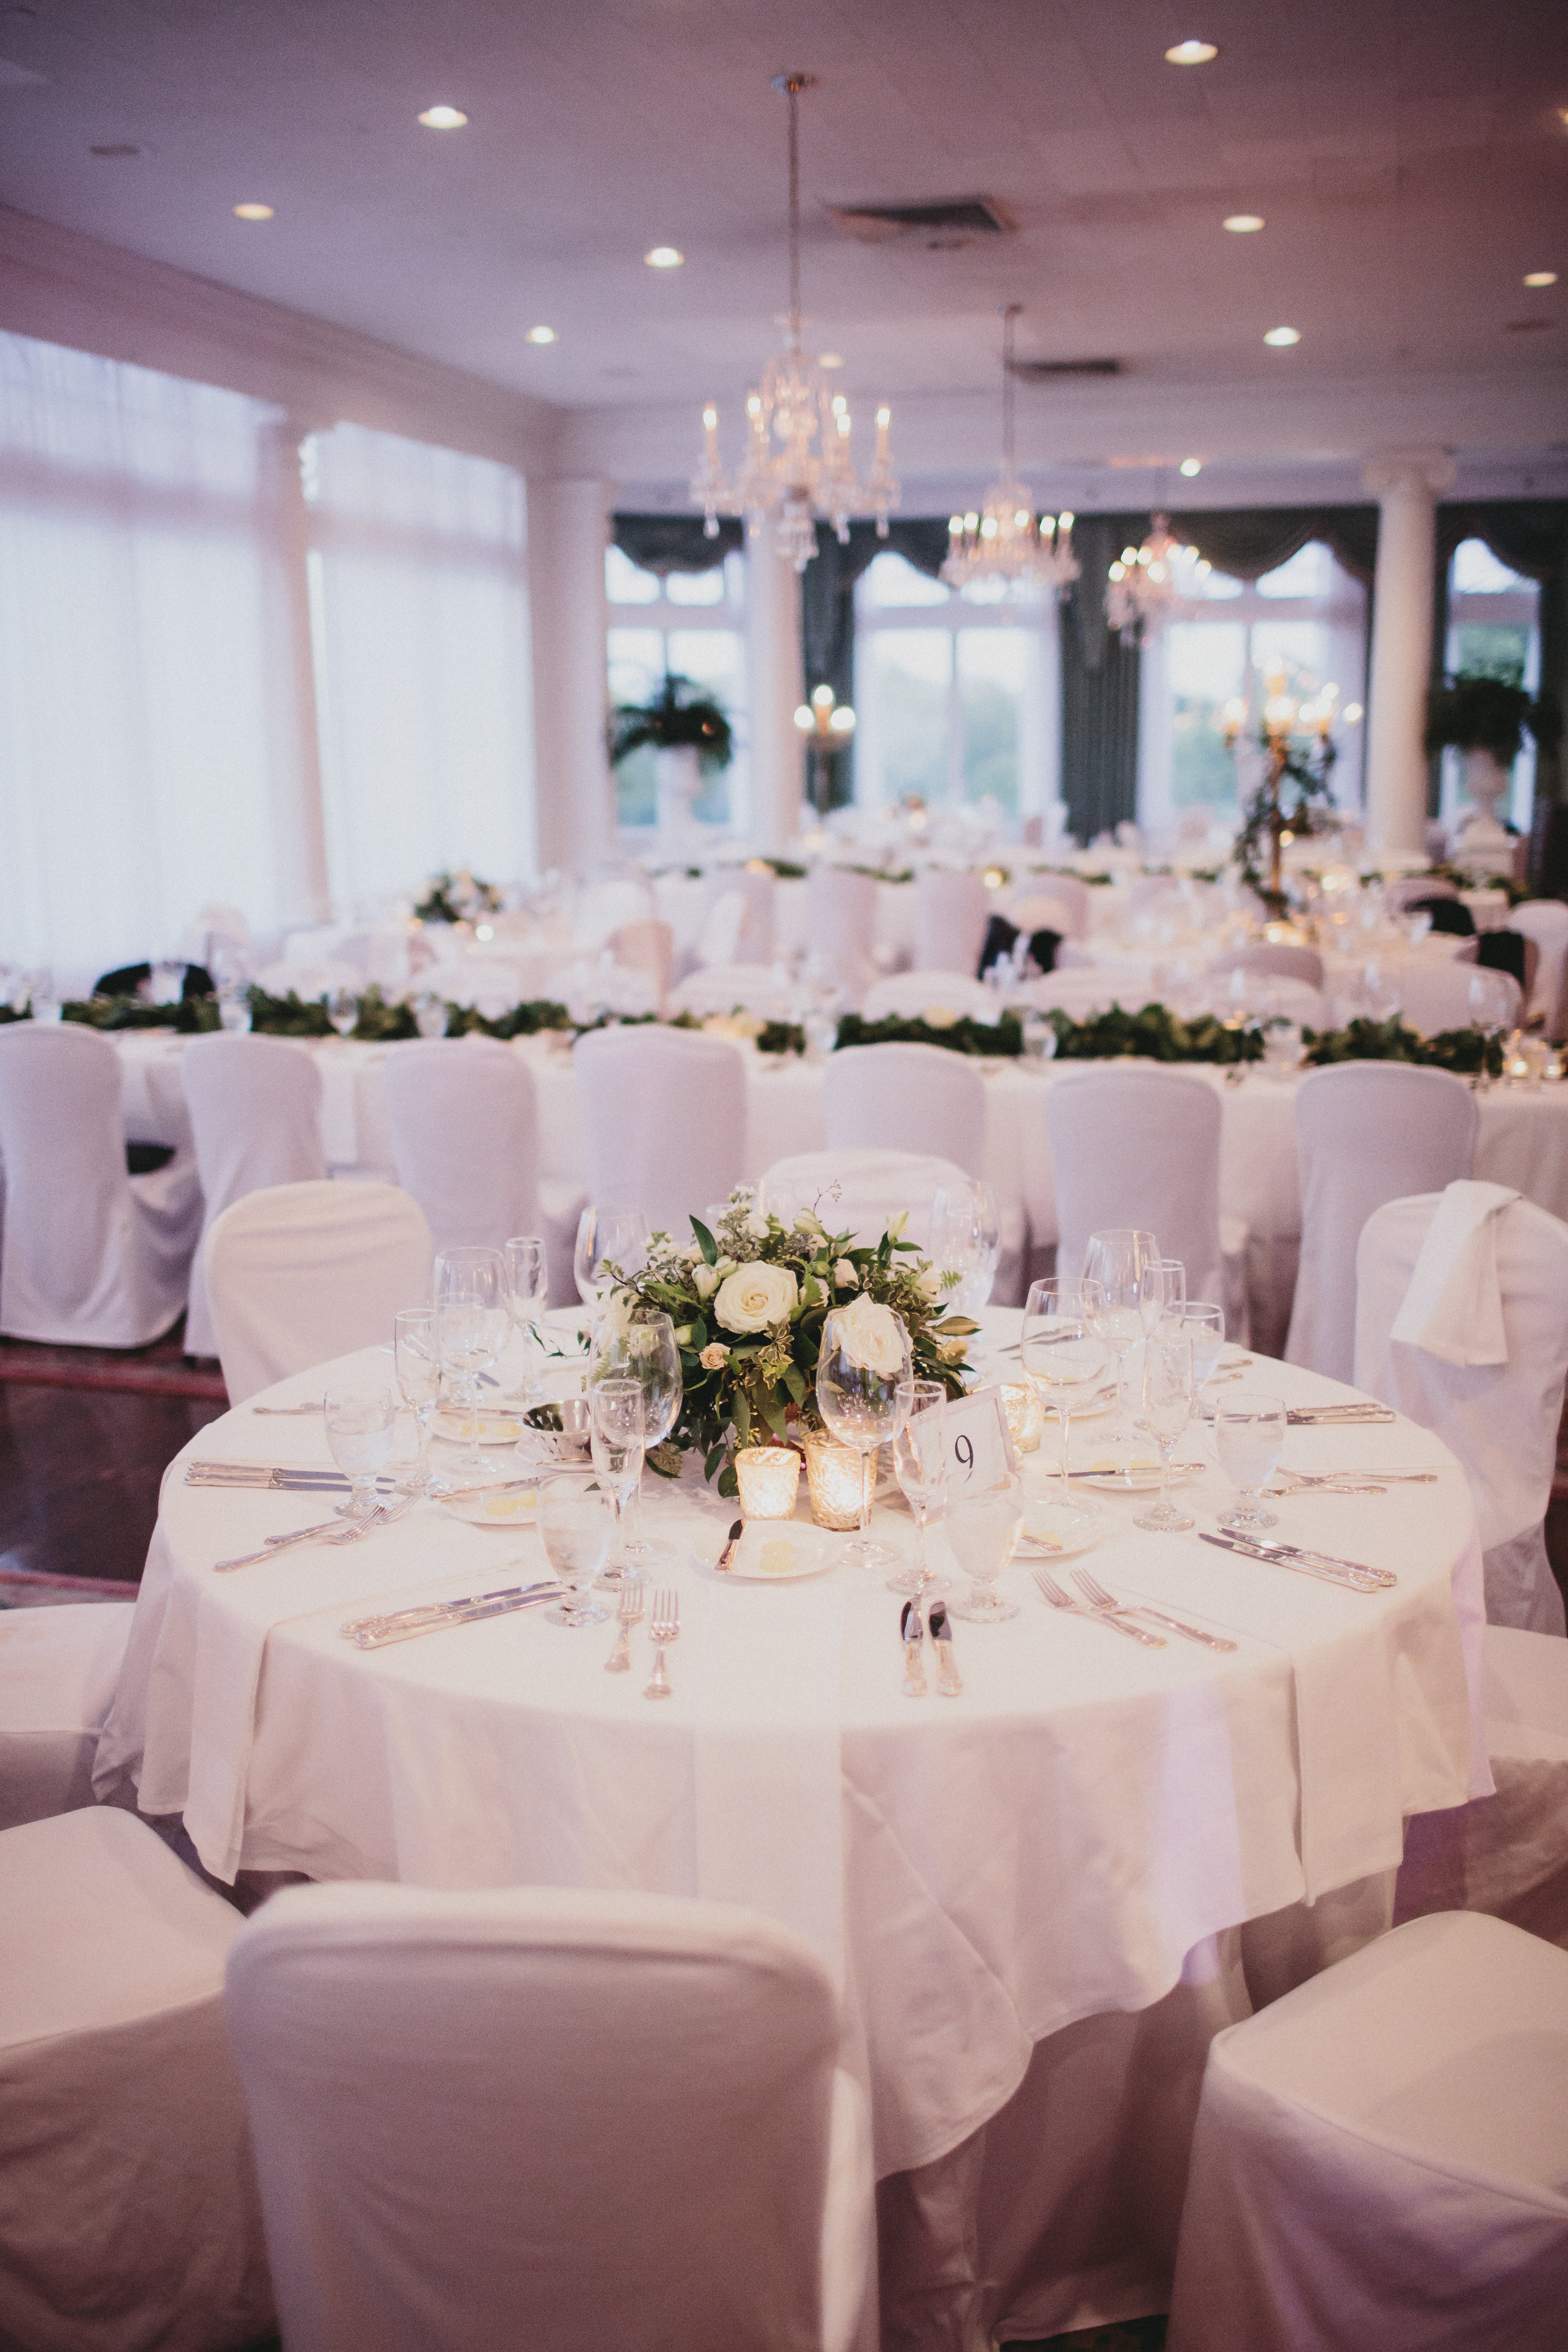 Wedding Reception green and white theme